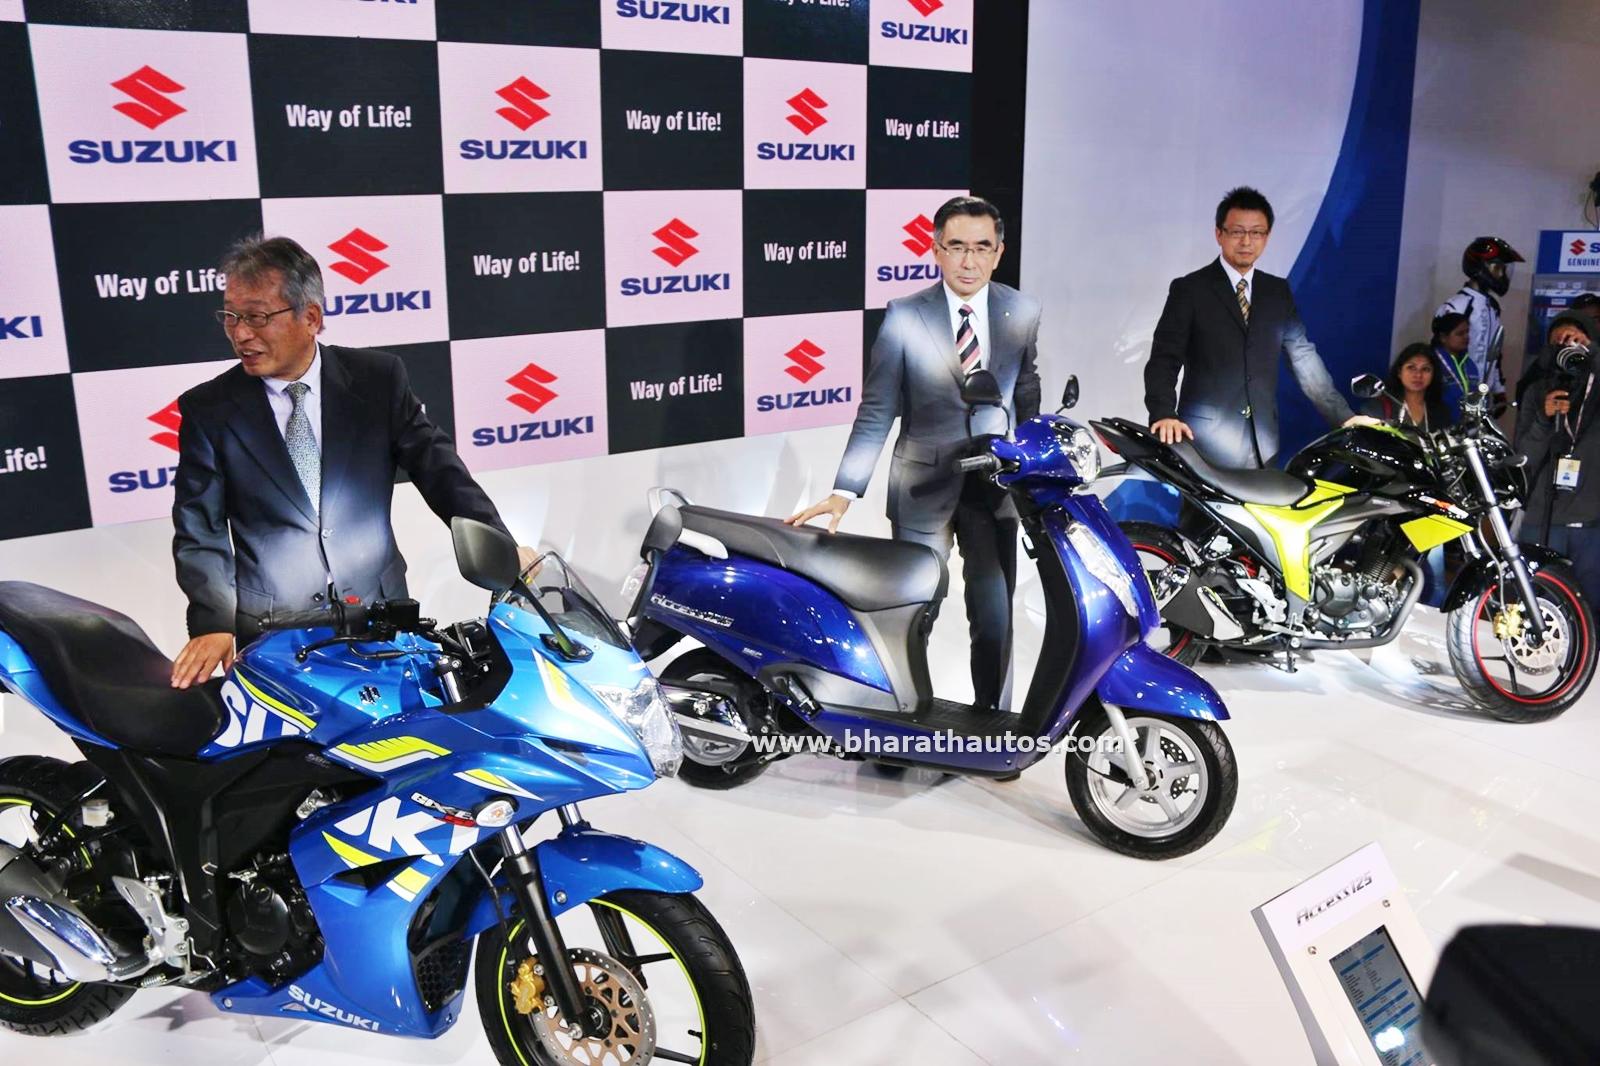 Suzuki quadsport z400 reviews prices and specs autos weblog suzuki - Suzuki Motorcycles India 2016 Auto Expo Pictures Photos